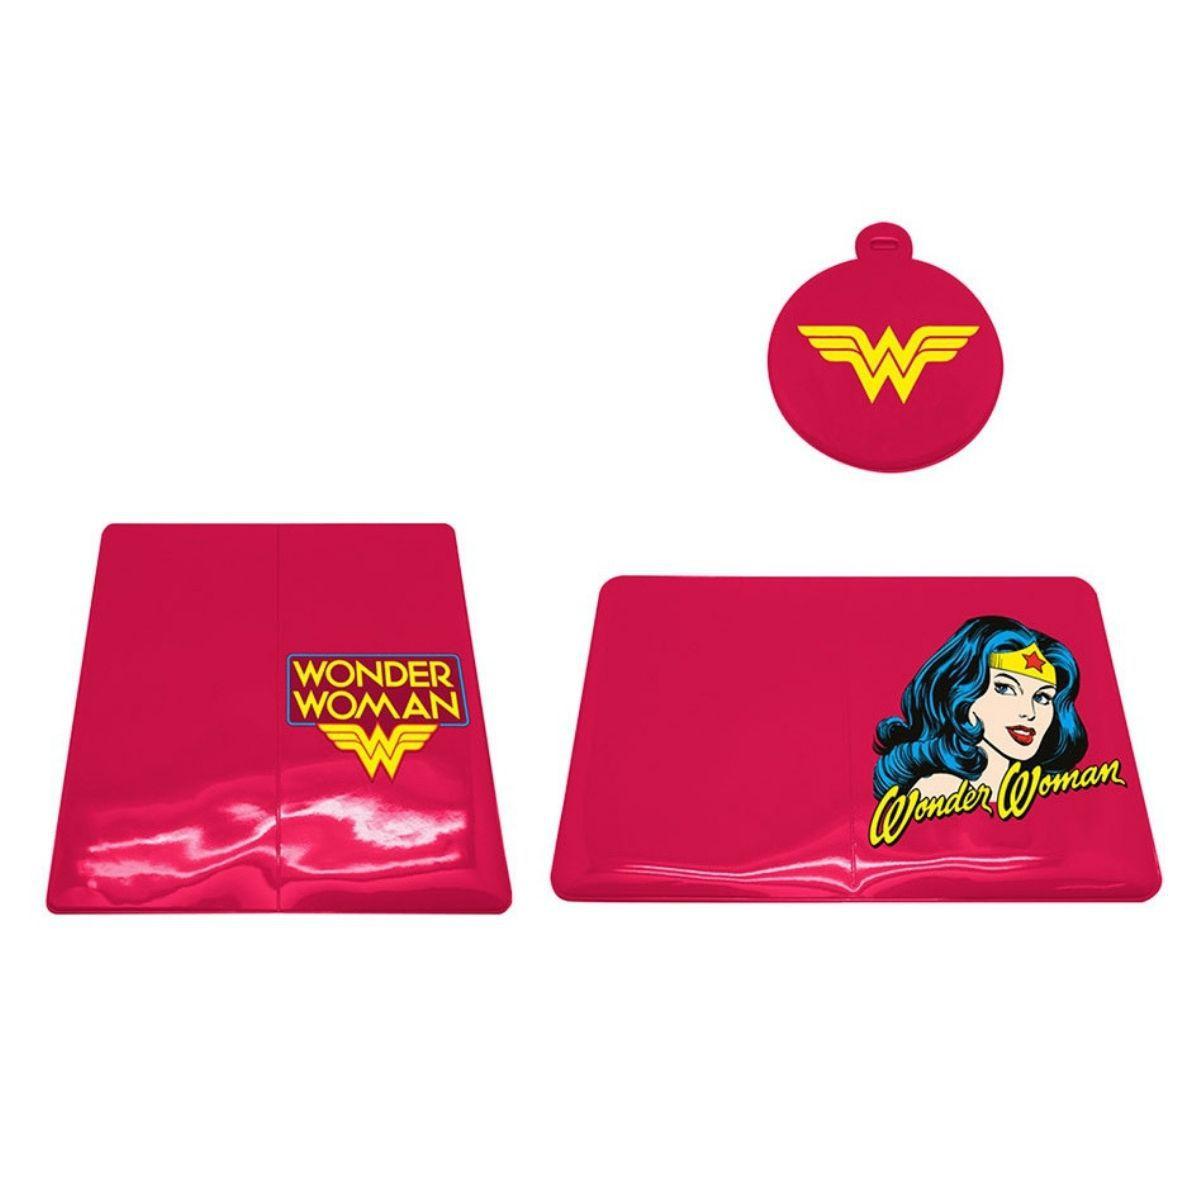 Set 3 Peças Viagem Pvc Dc Wonder Woman Pink - 68028240